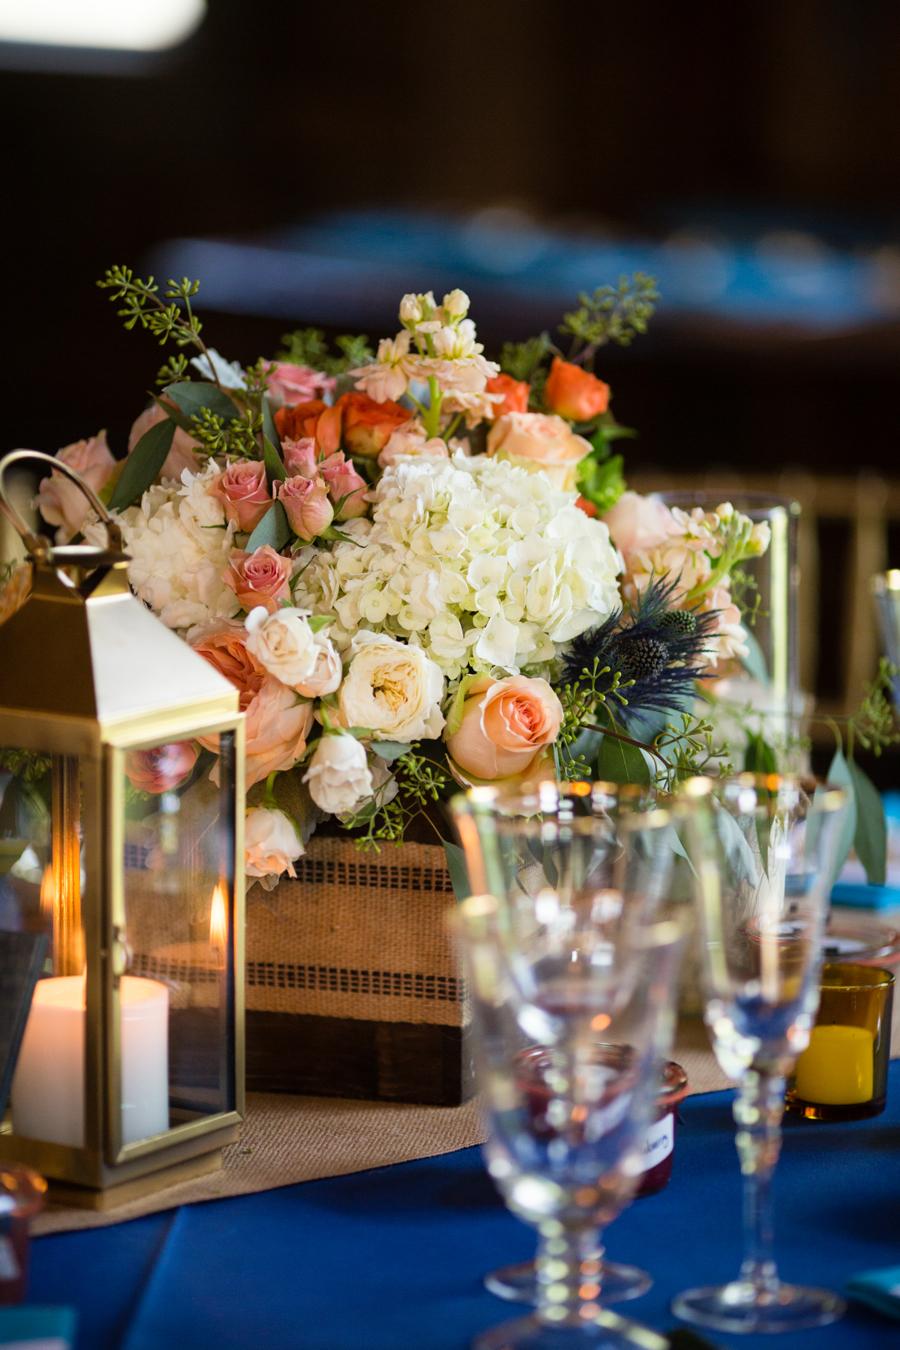 Maine Seasons Events barn wedding flowers photo Emilie, Inc.jpeg